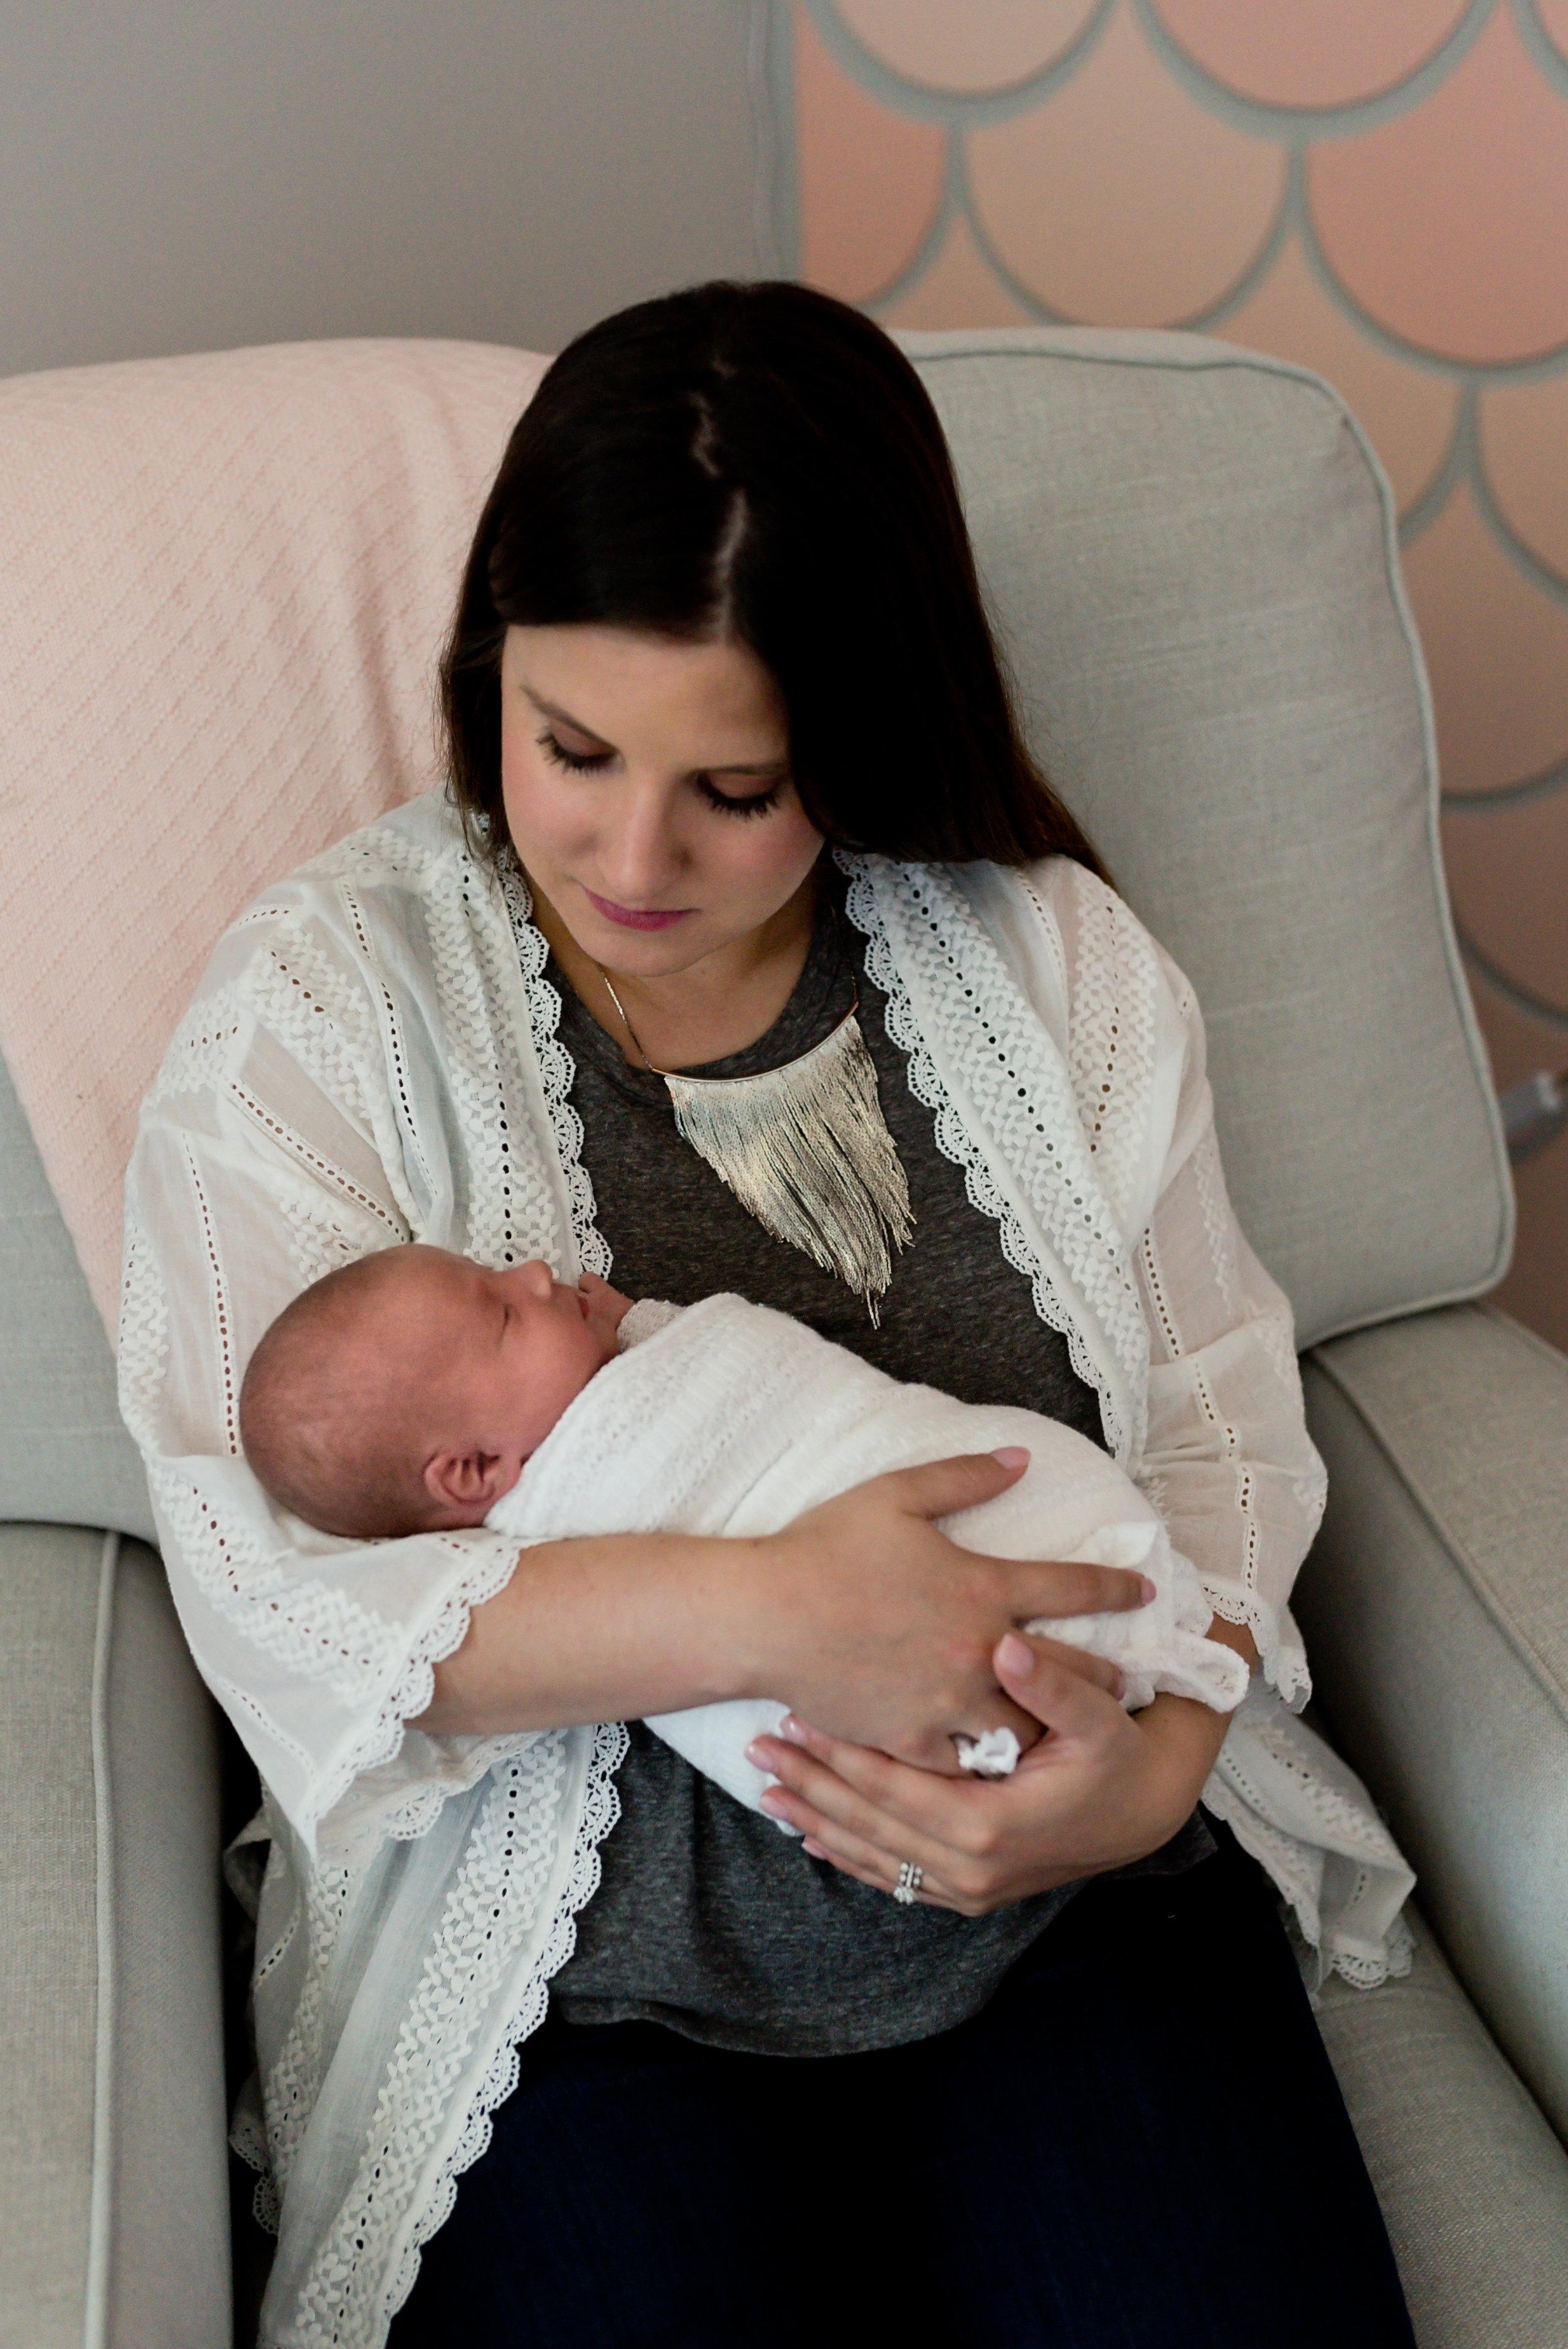 Charleston-Lifestyle-Newborn-Photographer-Following-Seas-Photography-7790 copy.jpg